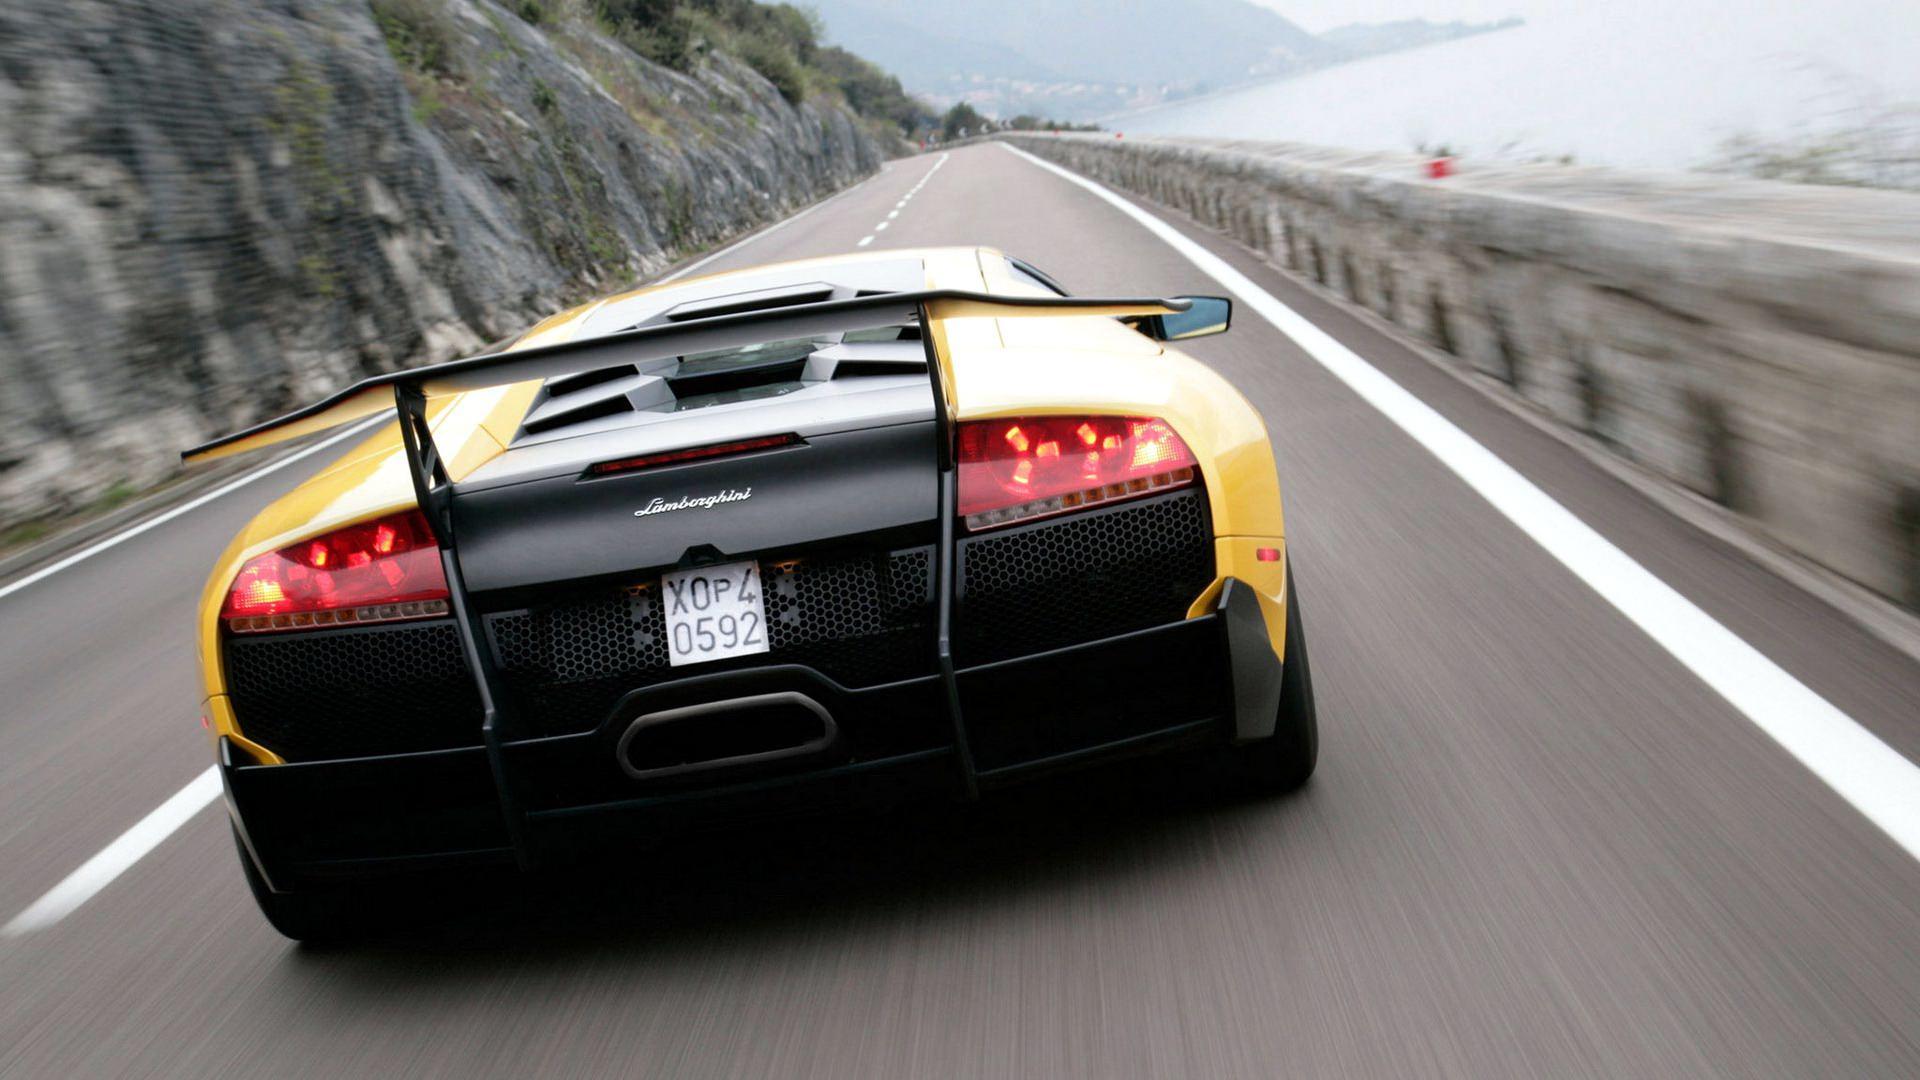 Lamborghini Murcielago Lp Sv Front Jackdarton Glare Night